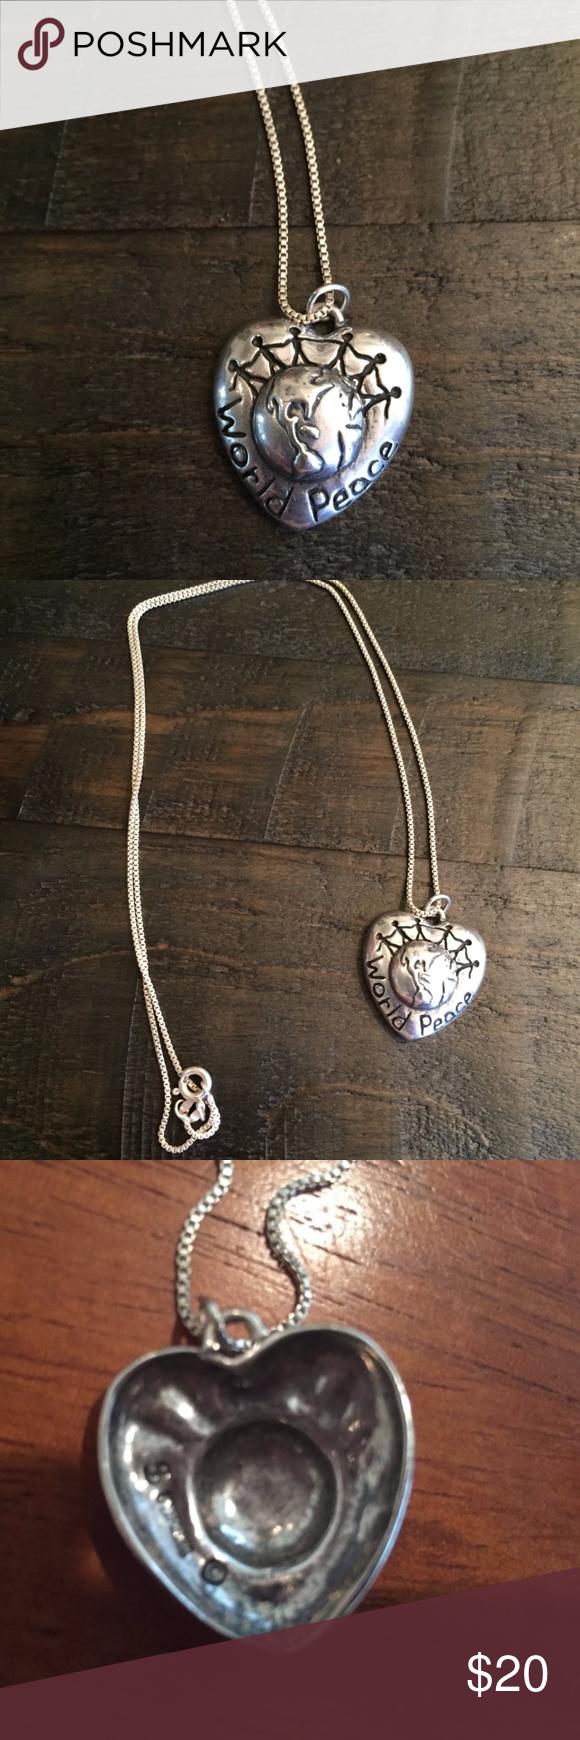 World peace pendant necklace peace silver pendants and pendants world peace pendant necklace this is a very nice world peace silver pendant and necklace aloadofball Choice Image